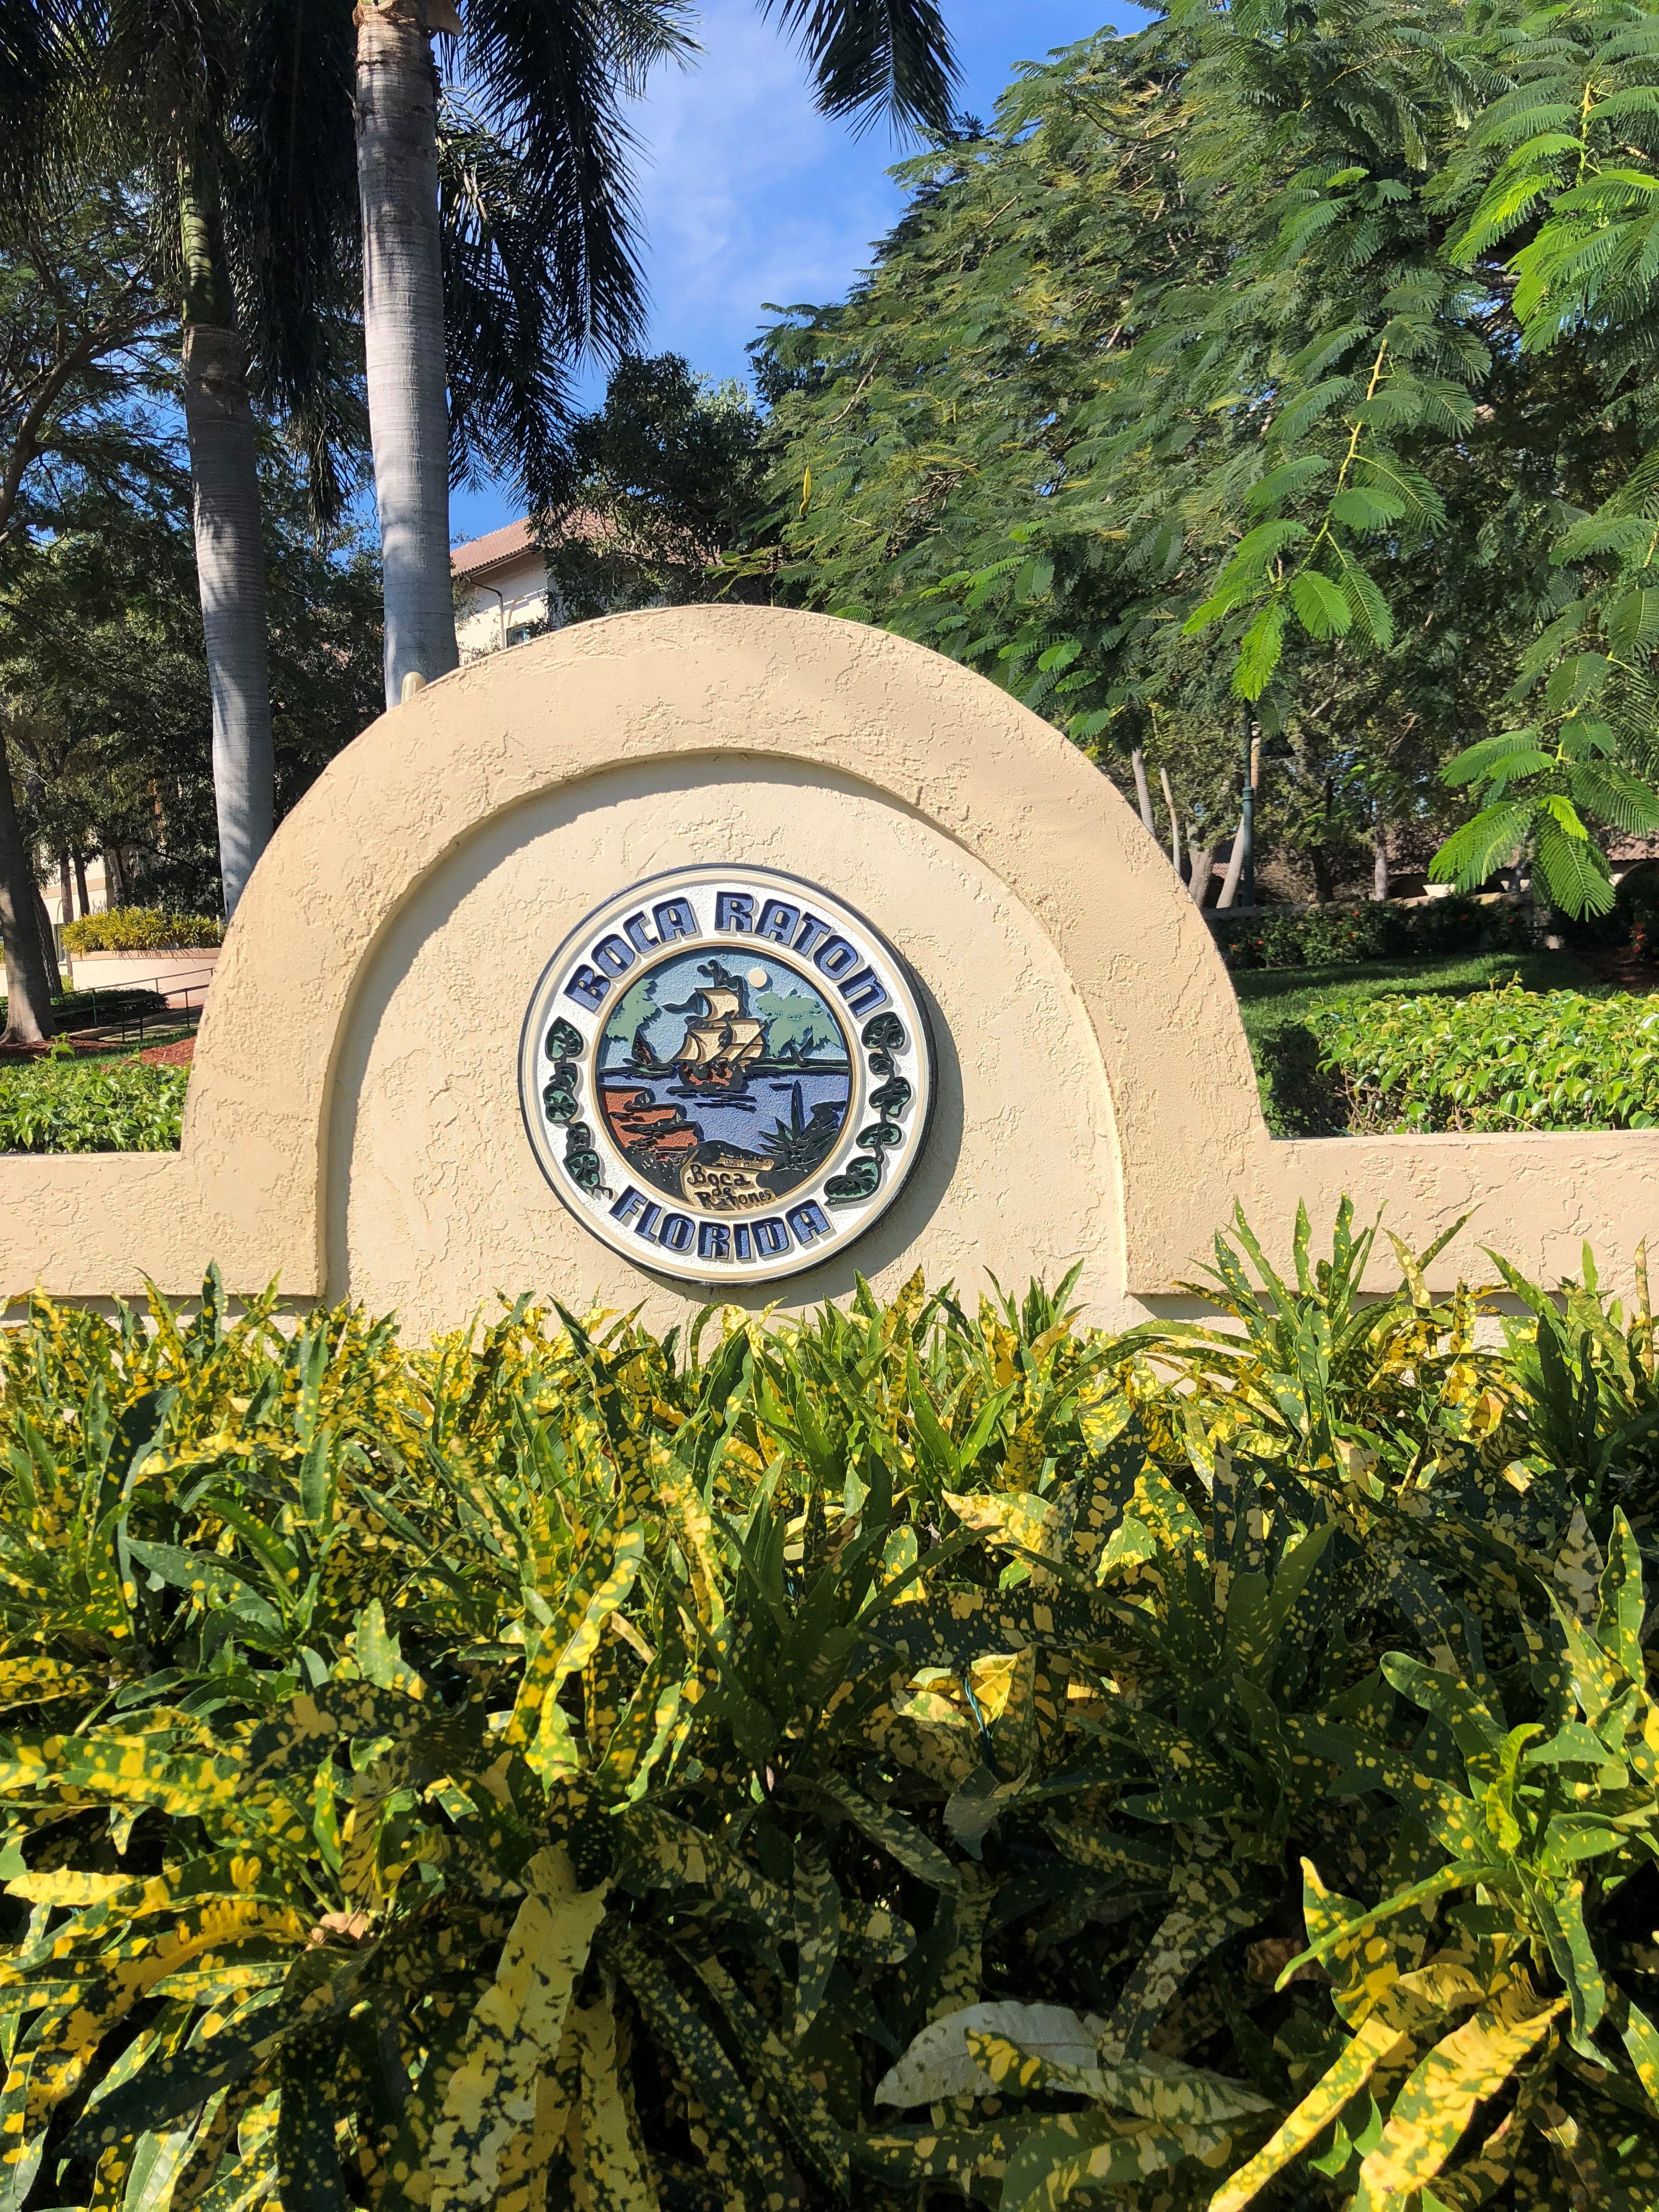 Boca city leaders reviewing downtown development plan